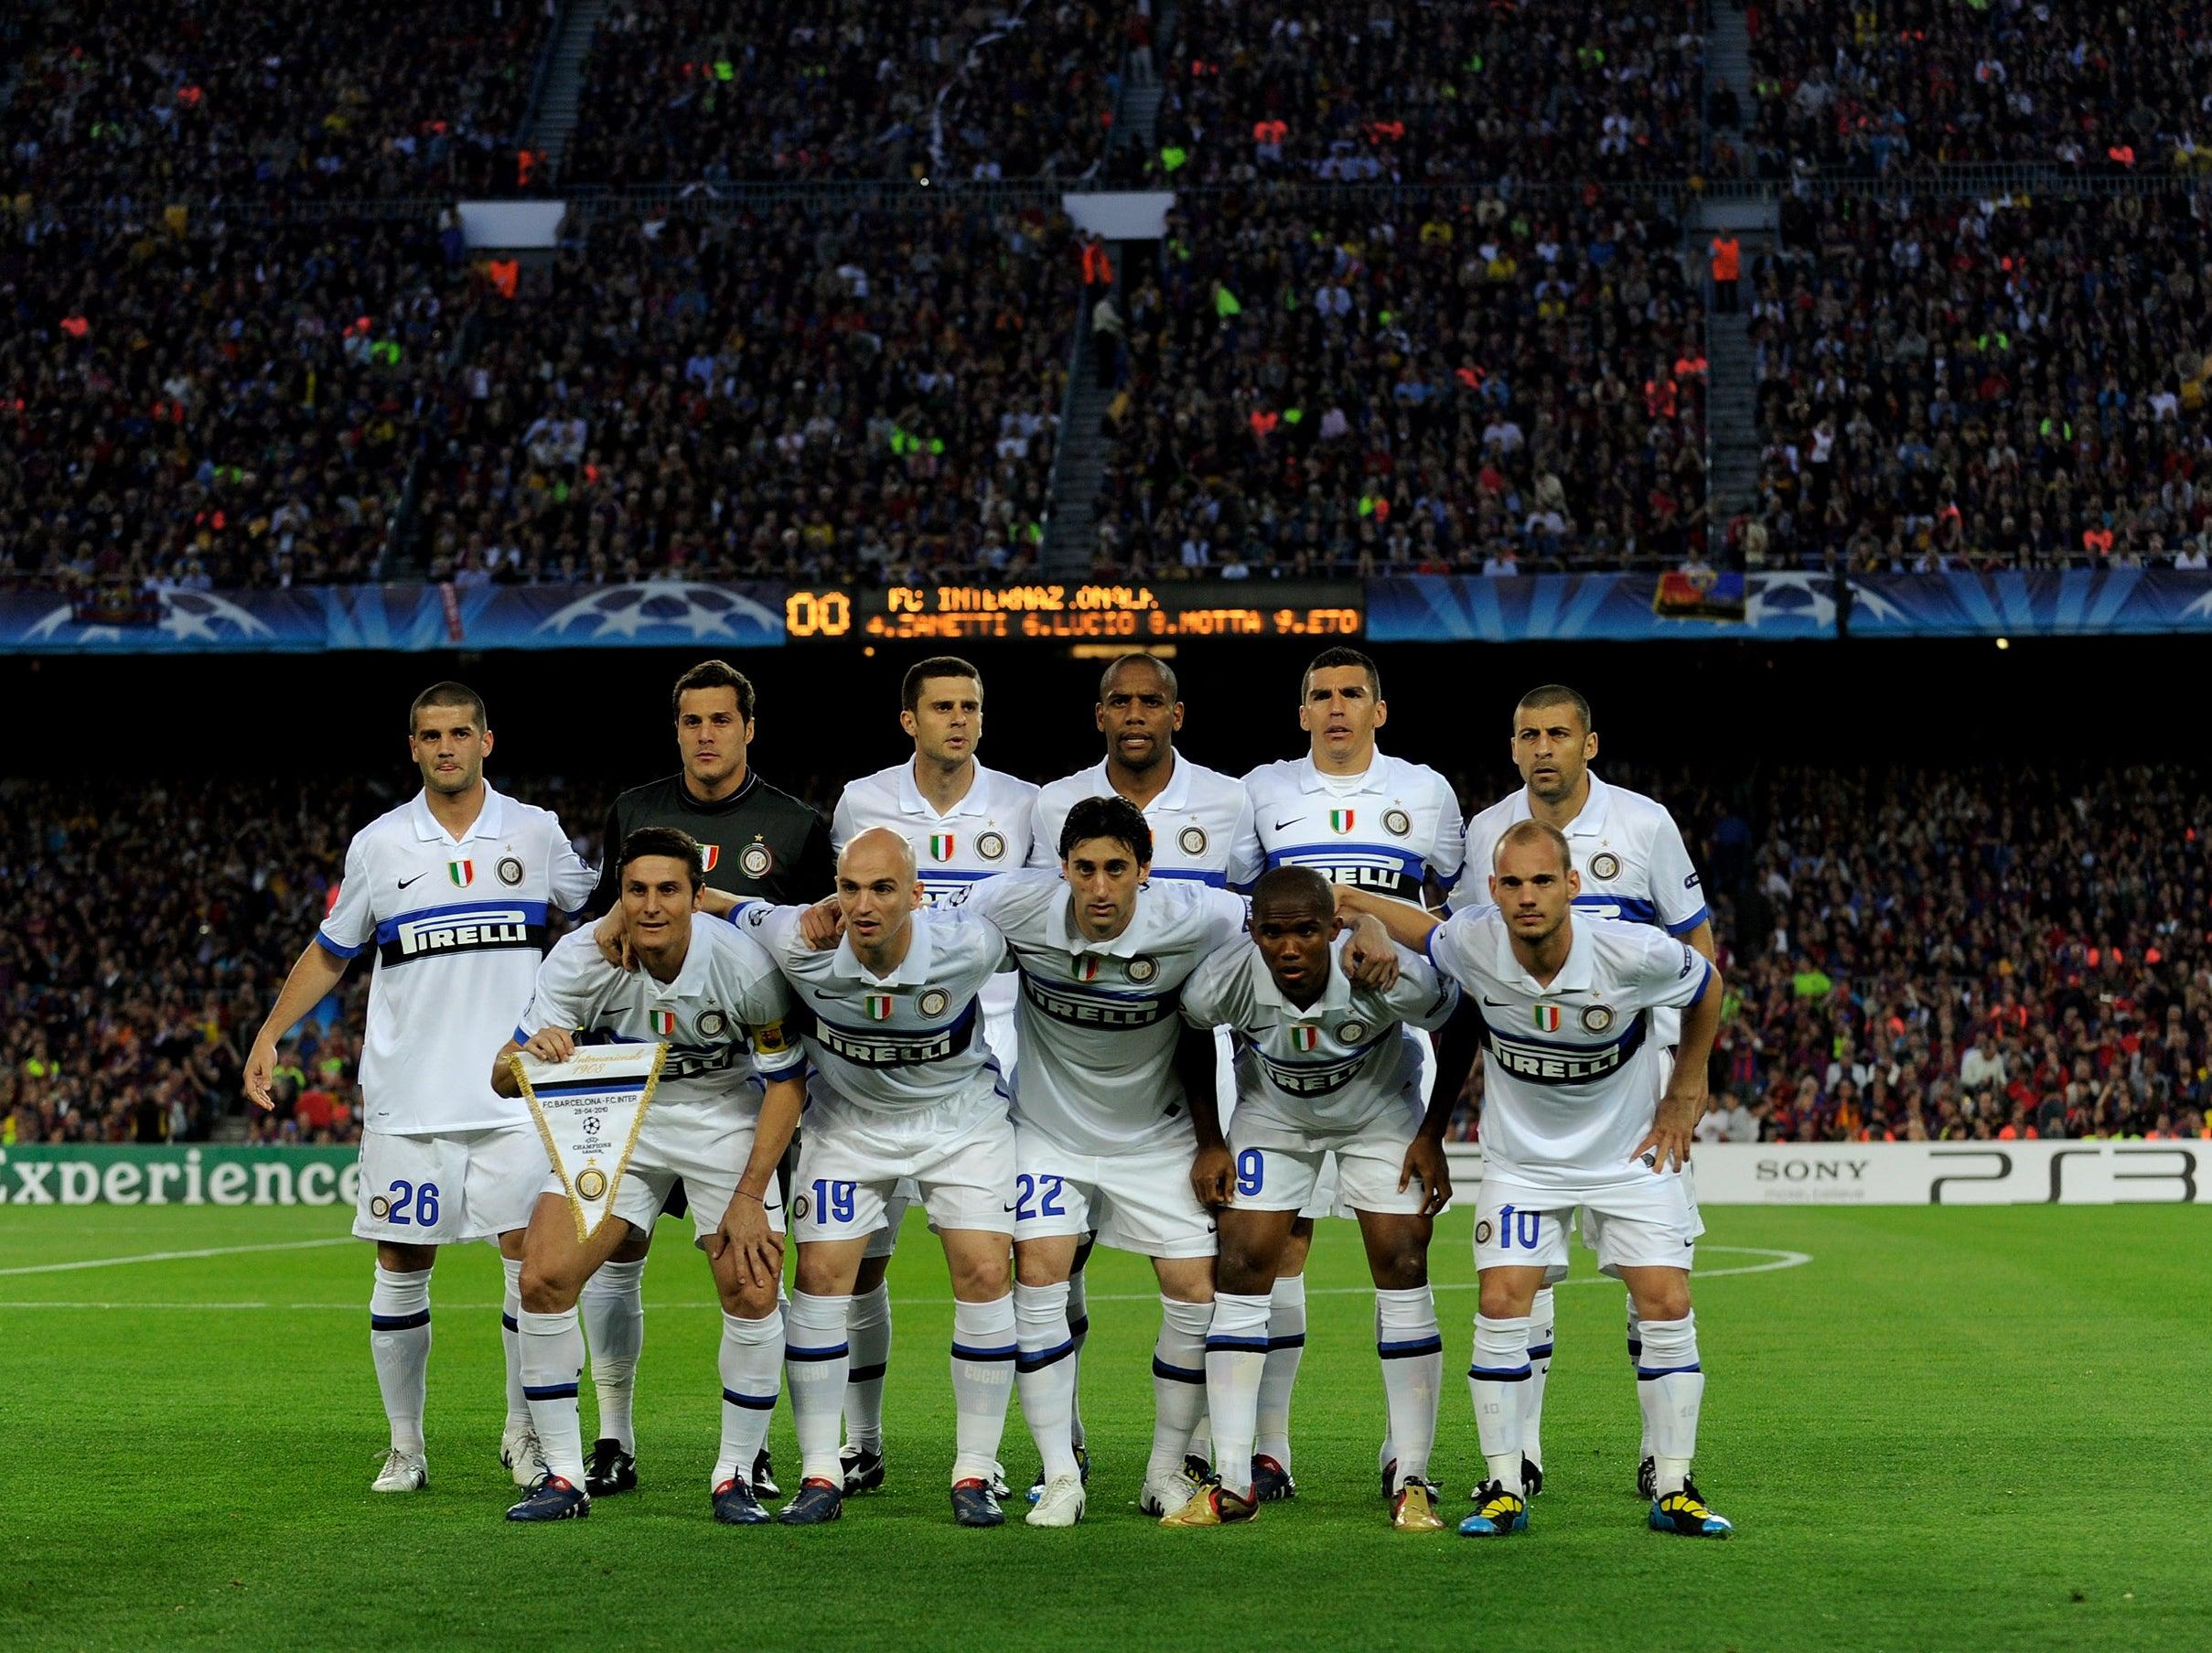 Футбол интер 10. 01. 2010